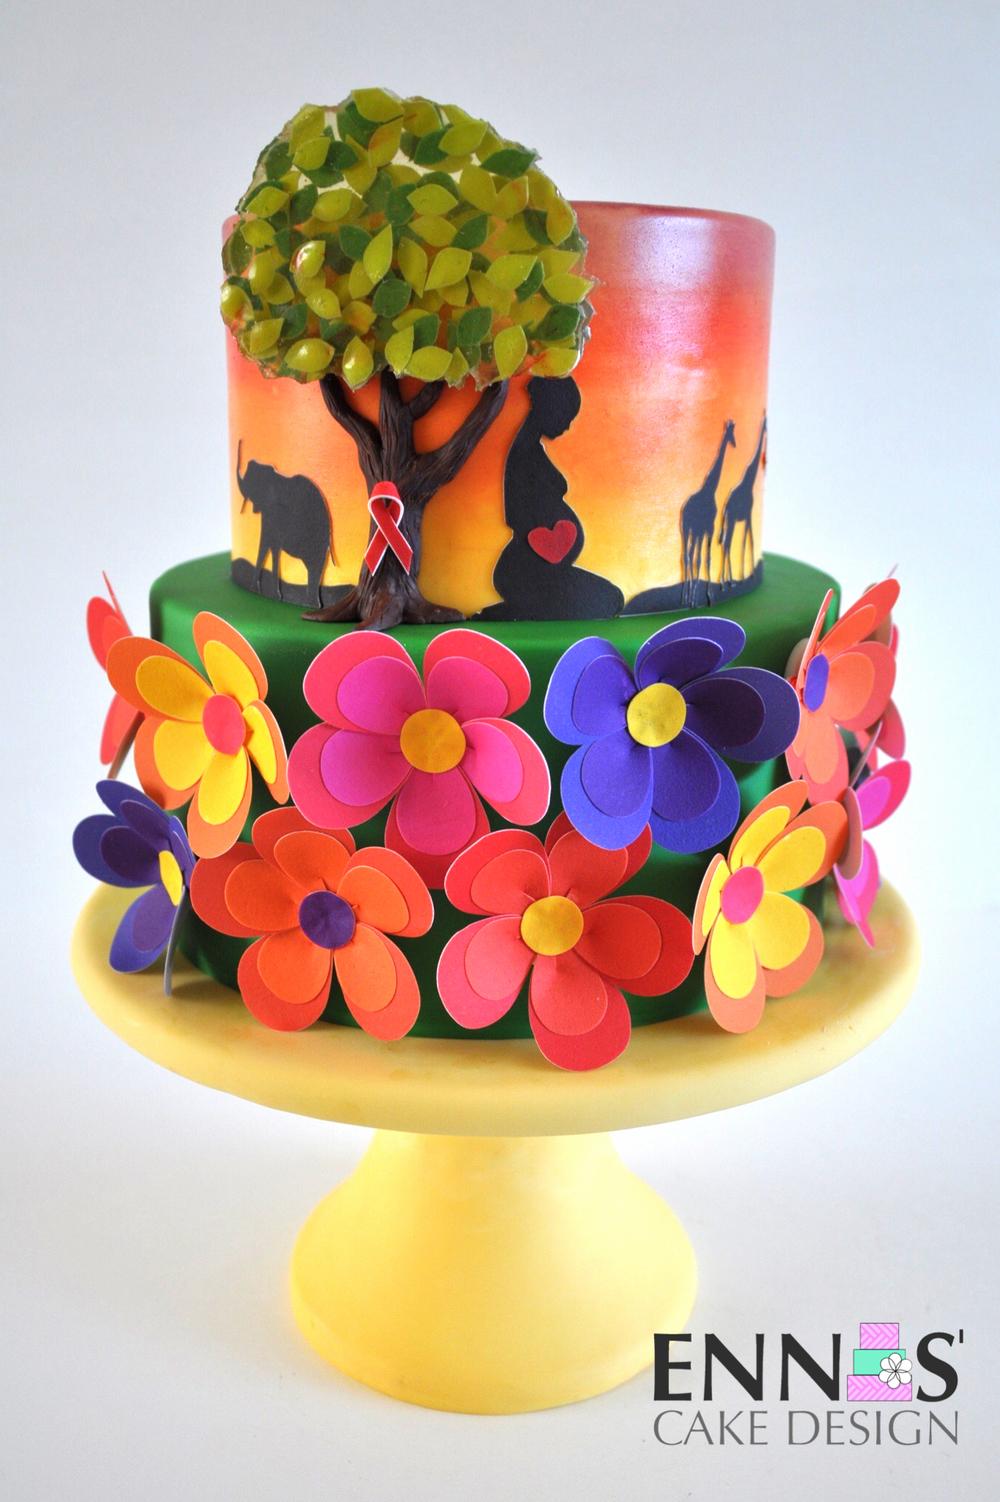 collaboration pieces ennas cake design